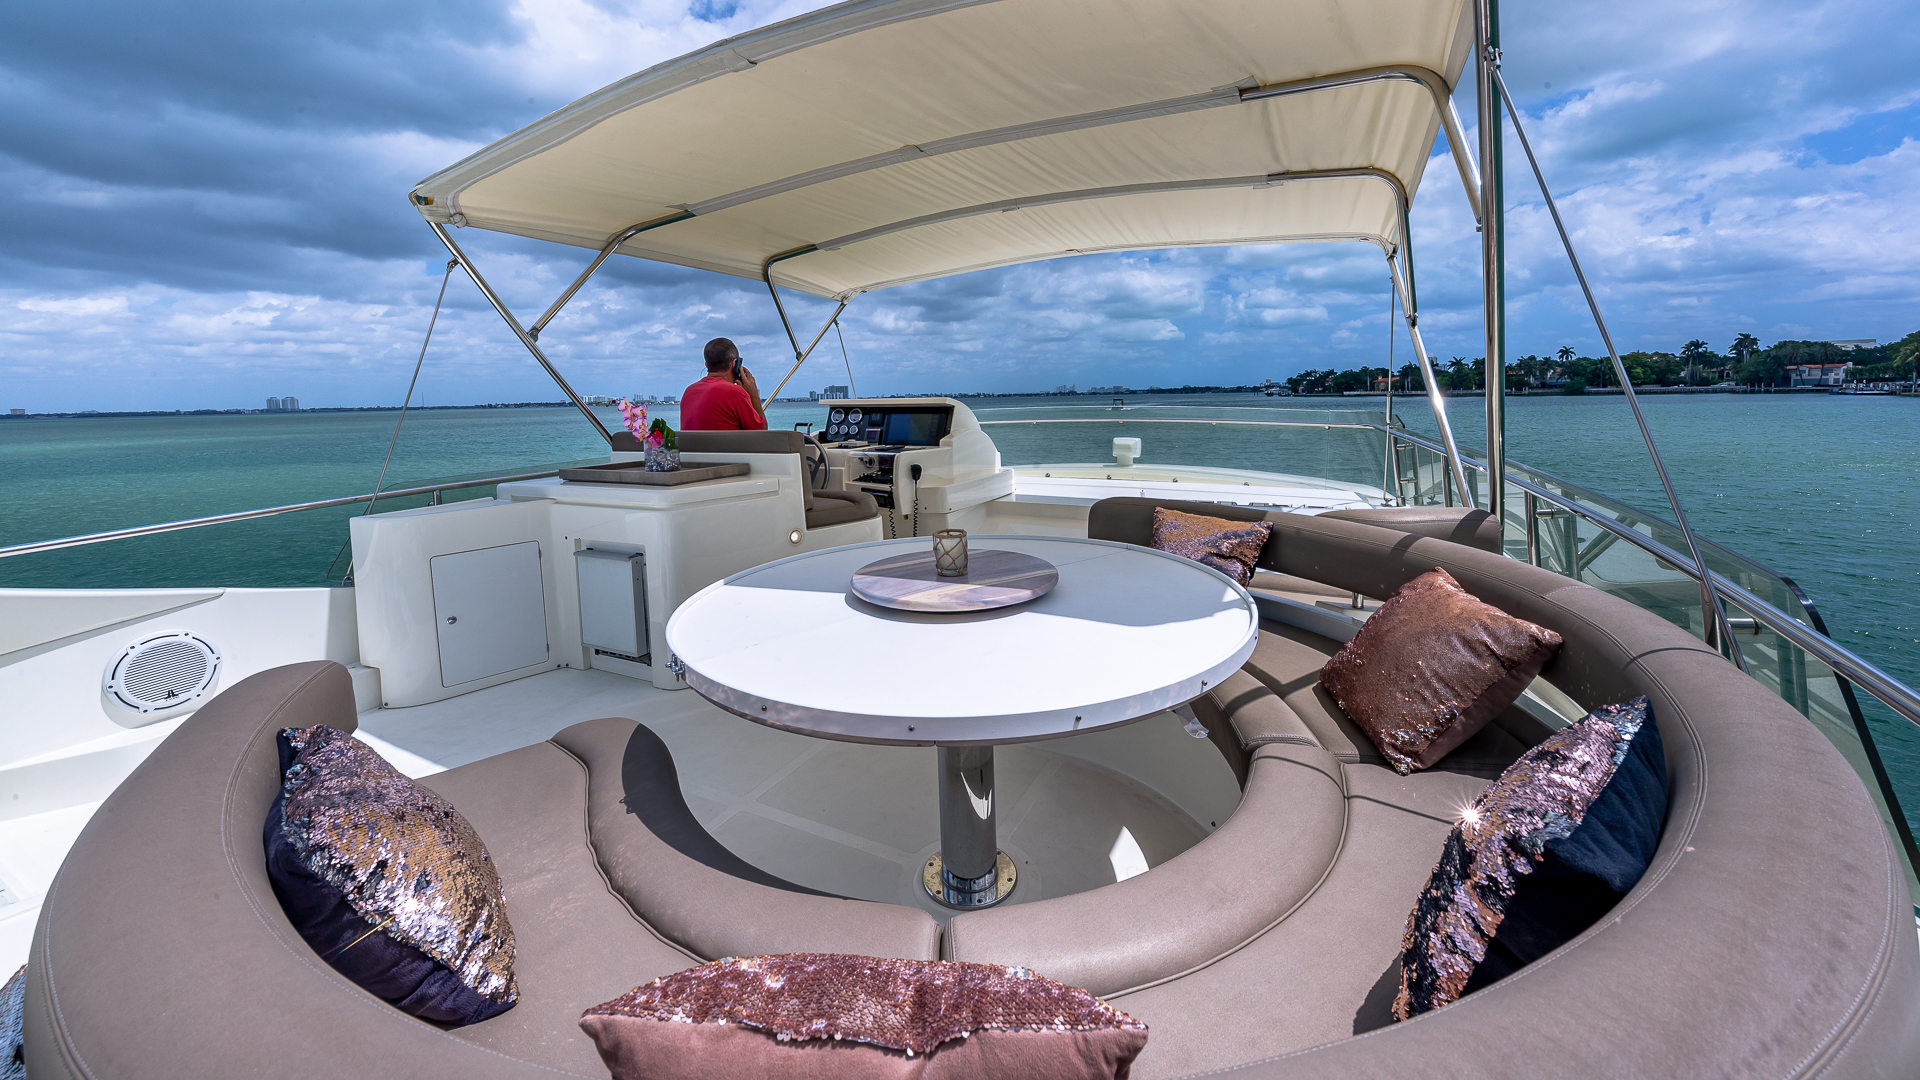 70' Ferretti Luxury Yacht Charters Miami 6